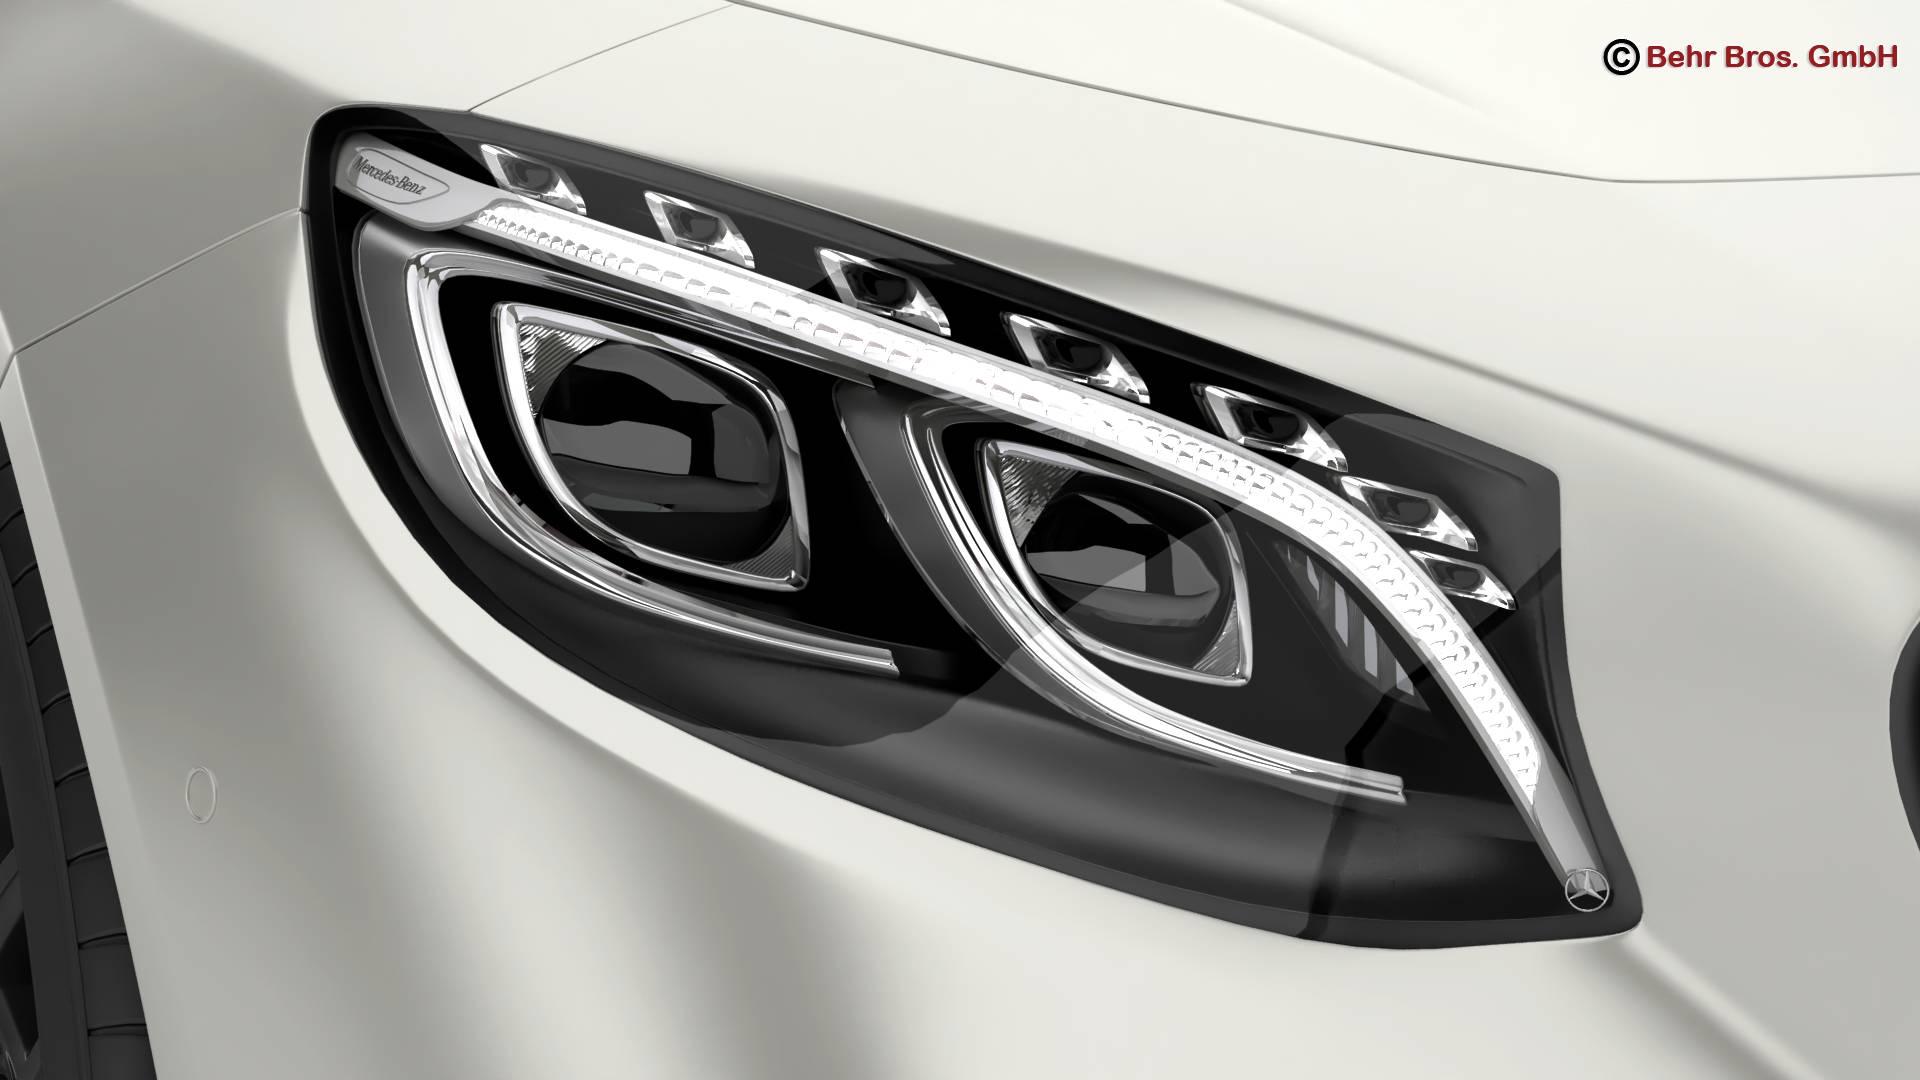 mercedes s class coupe amg s63 2018 3d model 3ds max fbx c4d lwo ma mb obj 274098